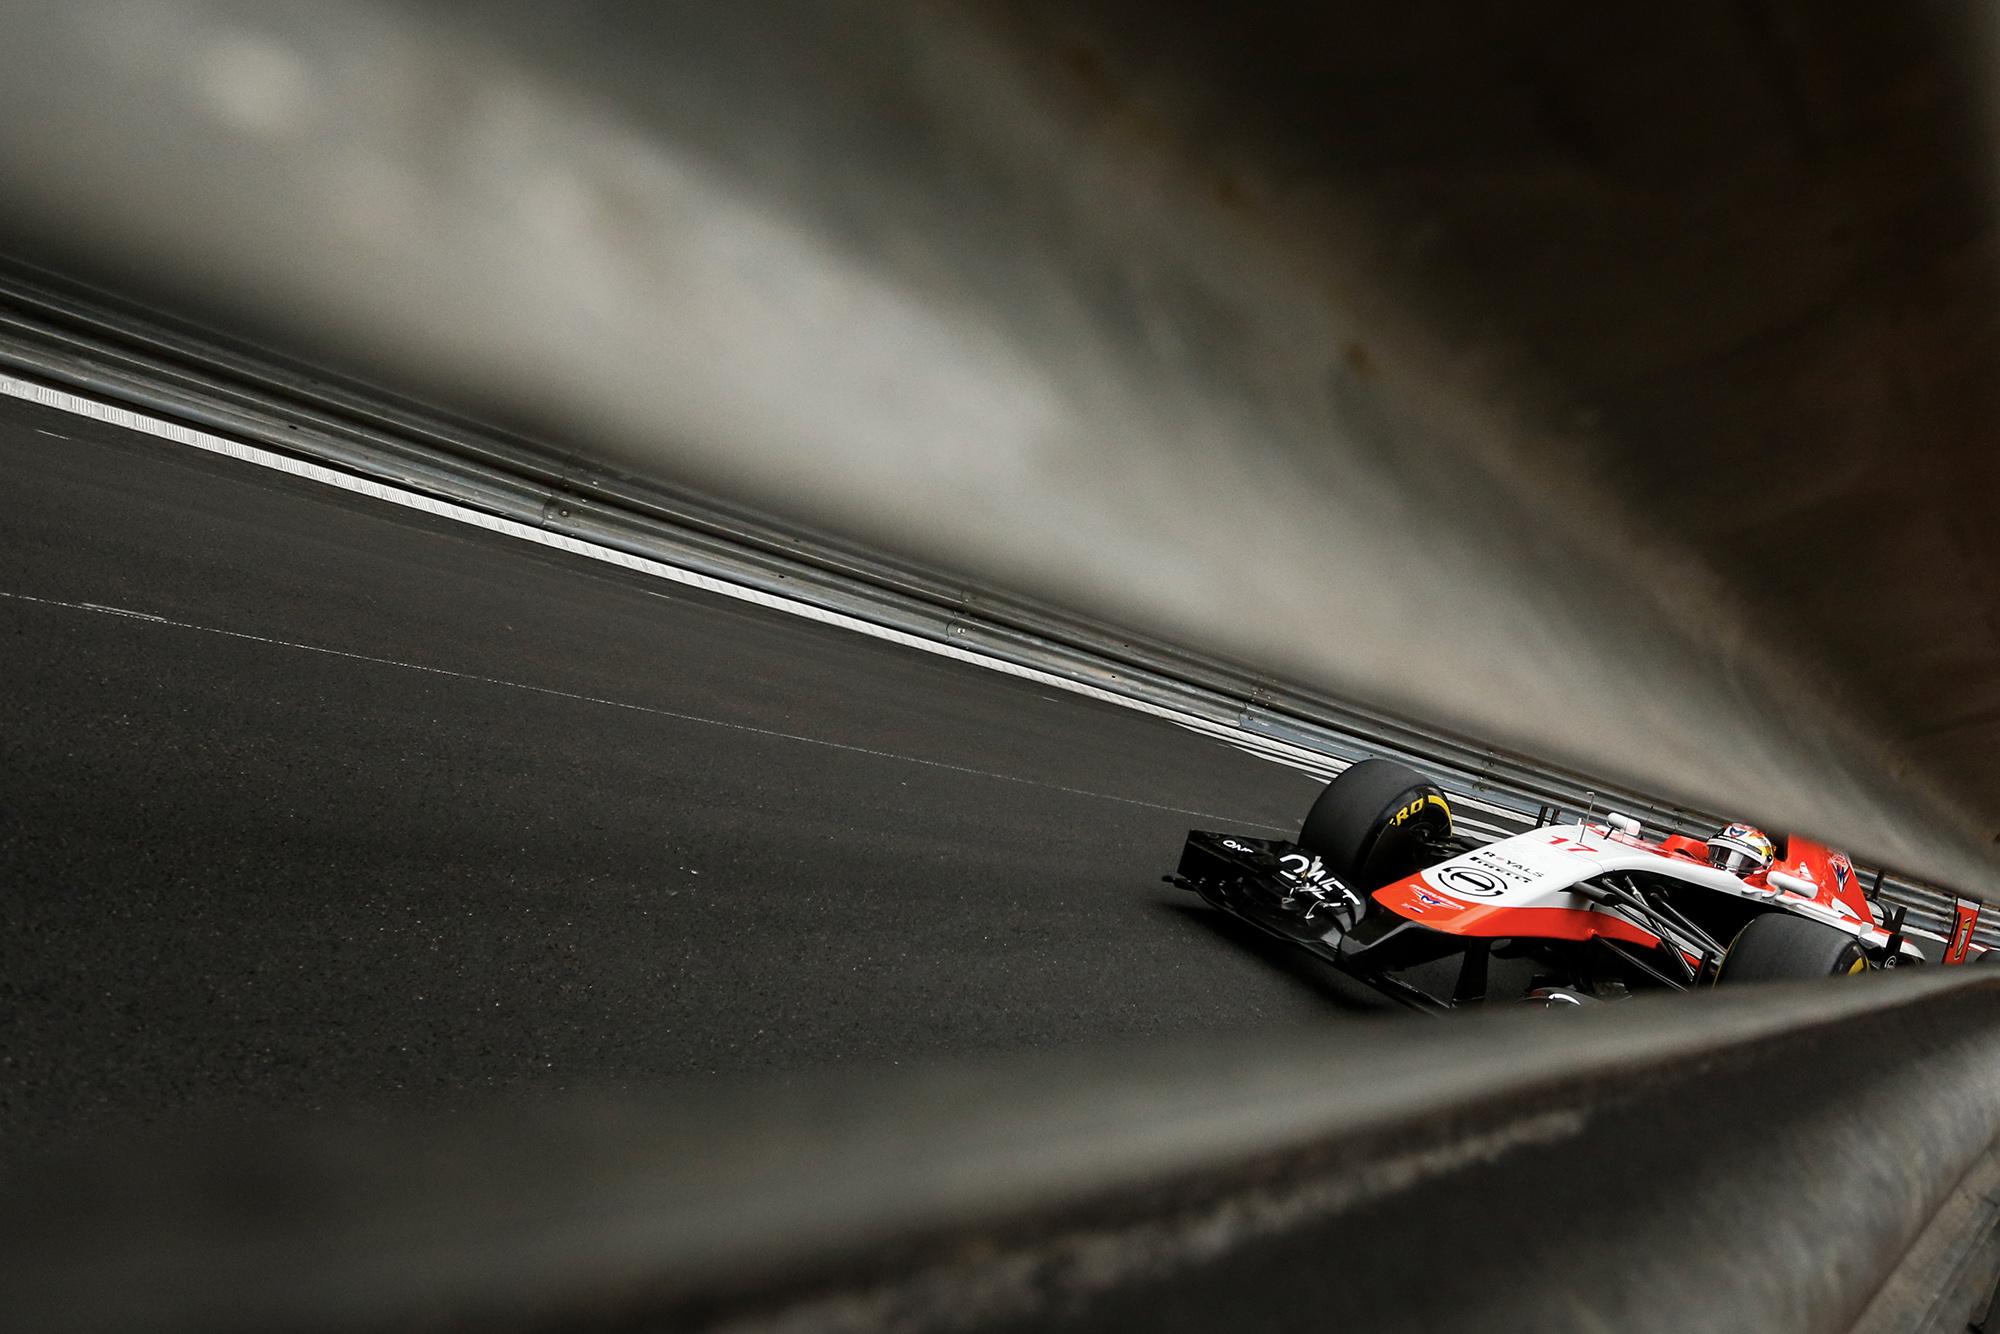 Jules Bianchi in a Marussia during the 2014 Monaco Grand Prix